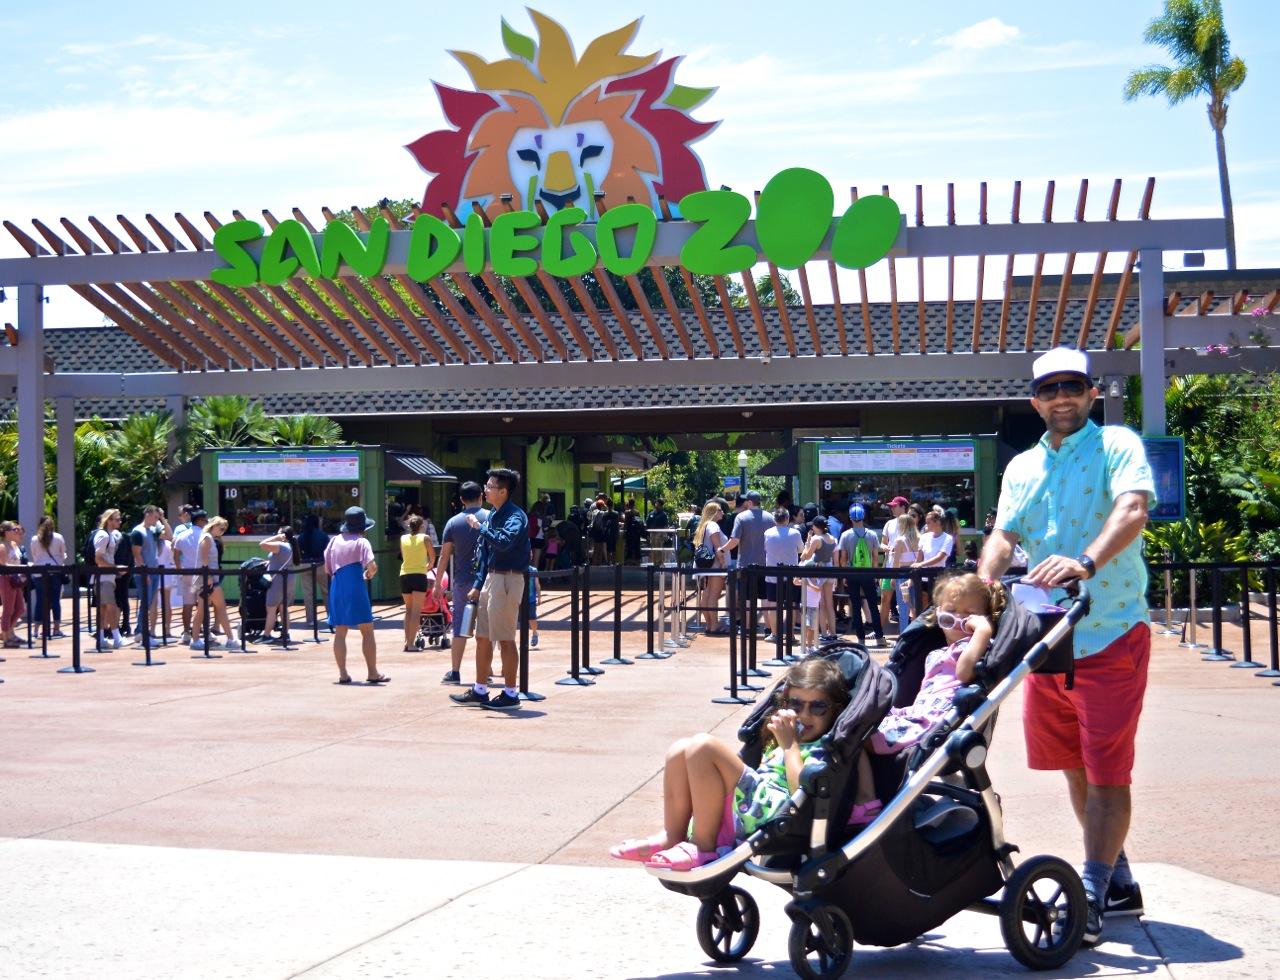 San Diego Zoo July 2018 3.jpg